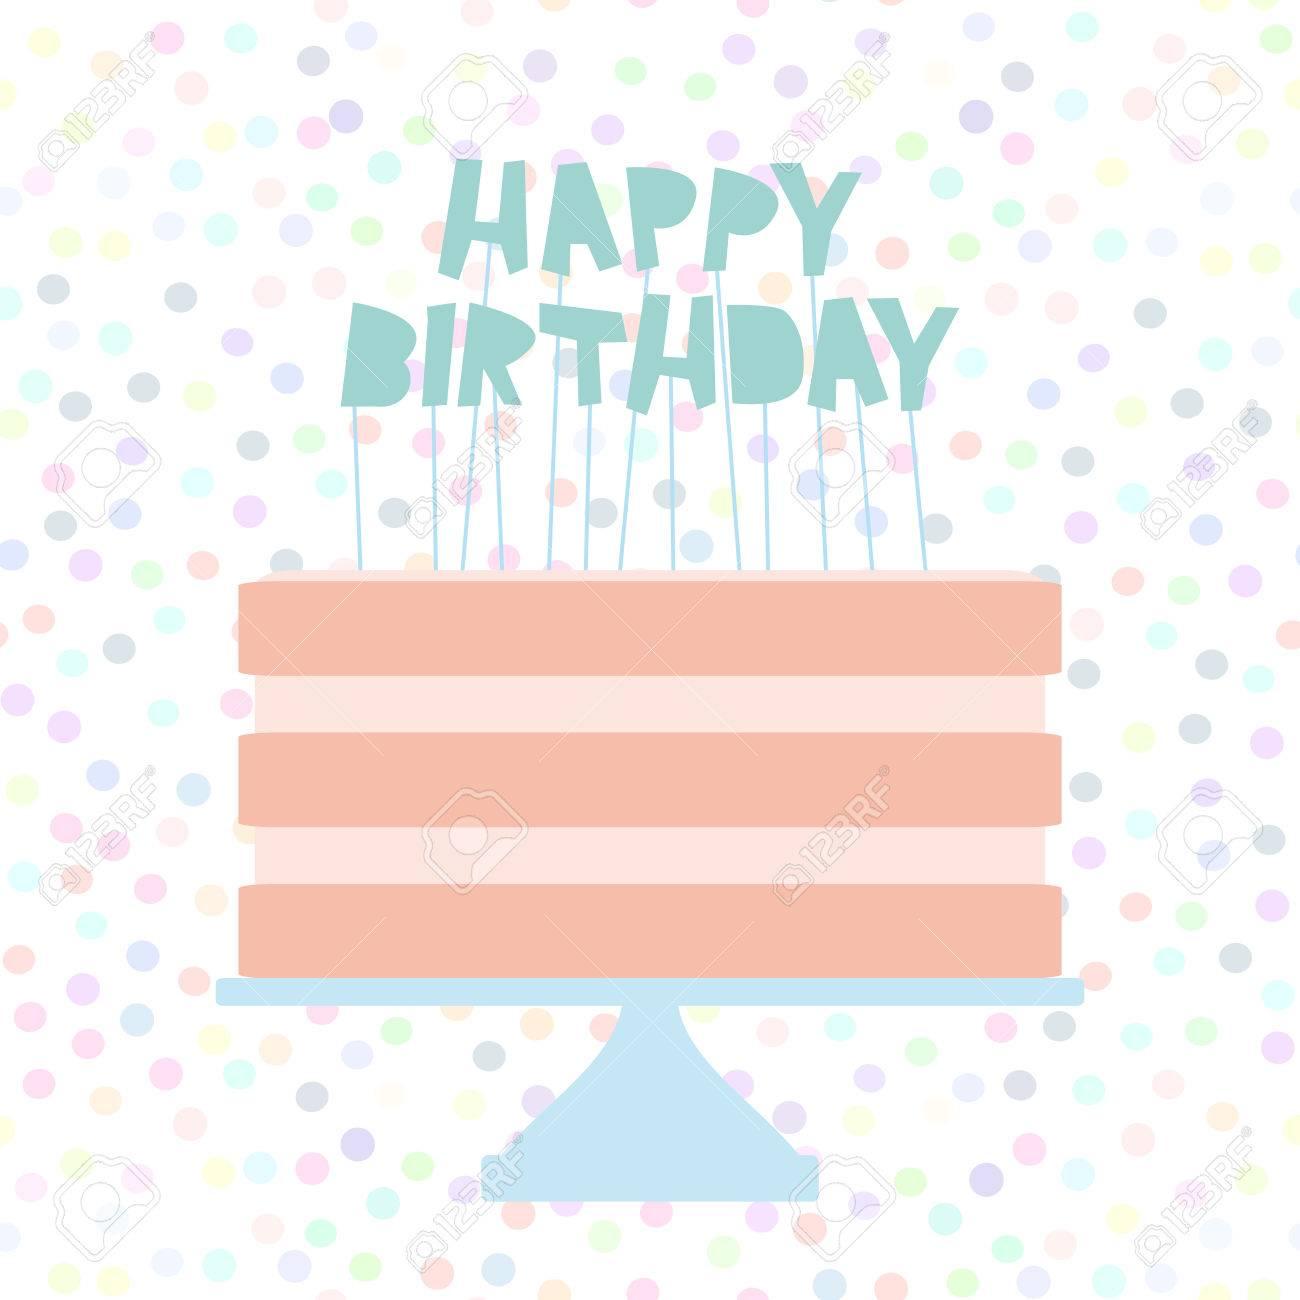 Happy Birthday Sweet Pink Cake Strawberry Pink Cream Banner